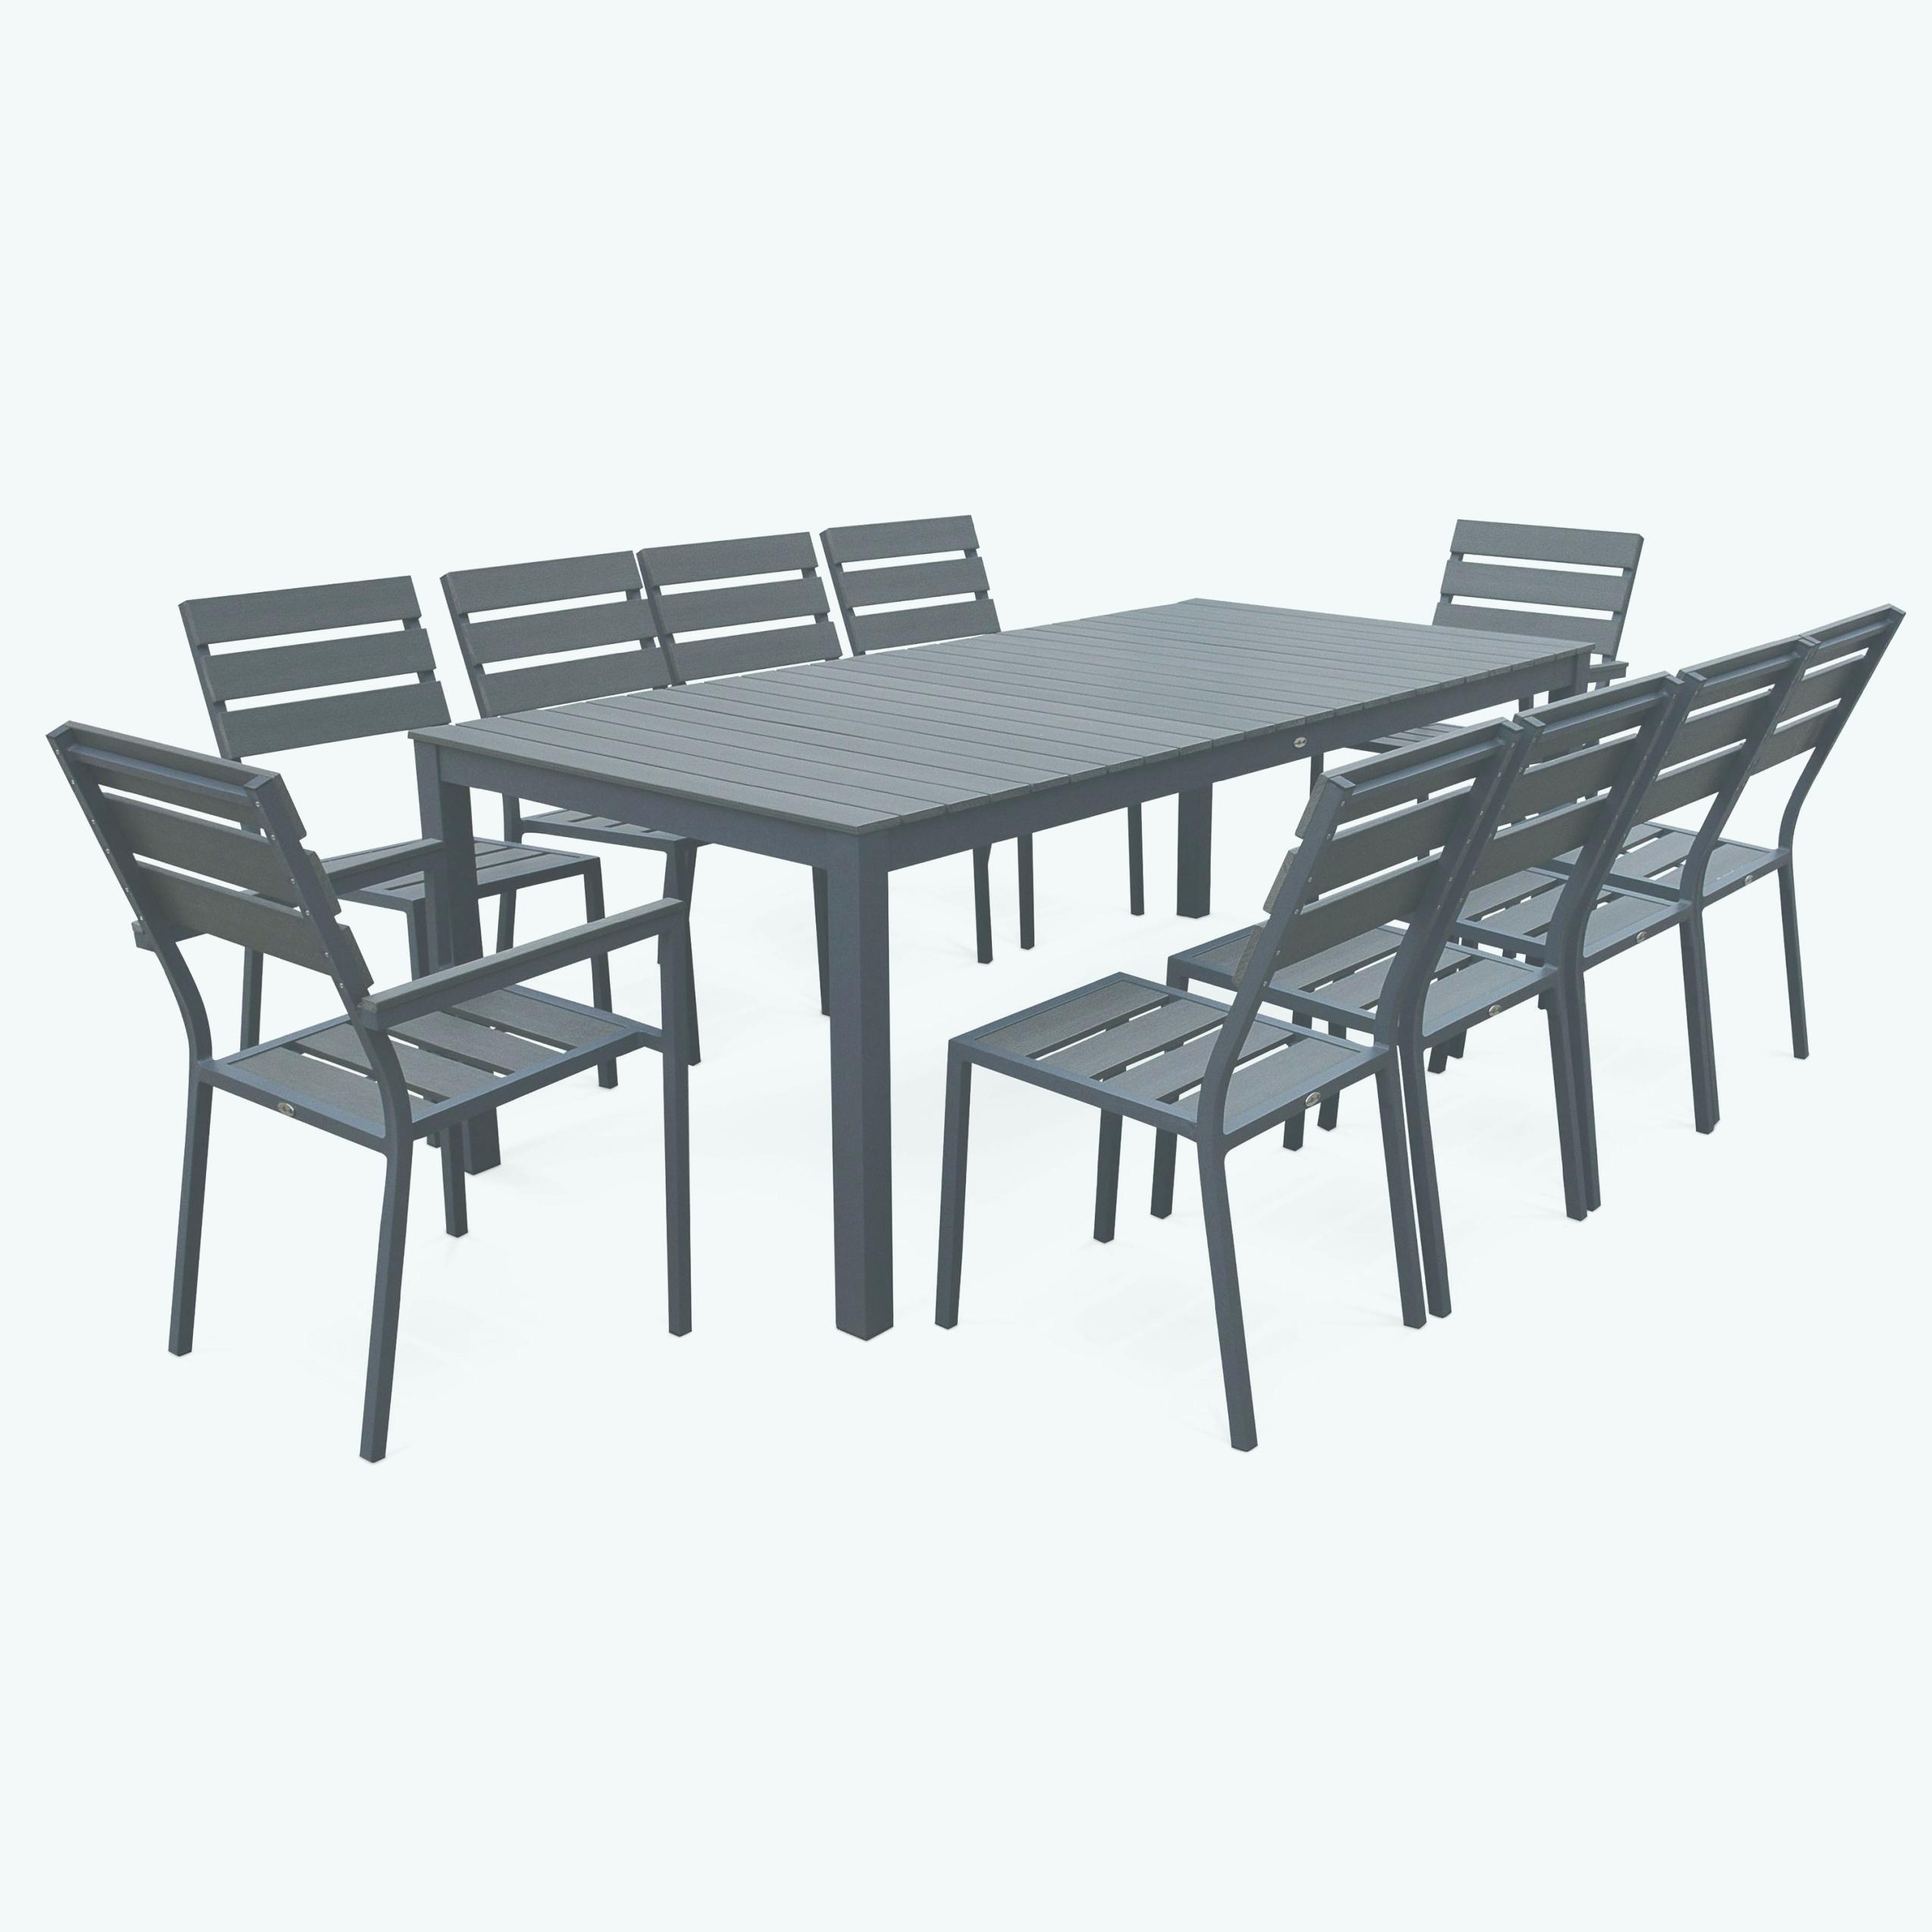 Table Basse Salon De Jardin Gifi Élégant Gifi Table Jardin tout